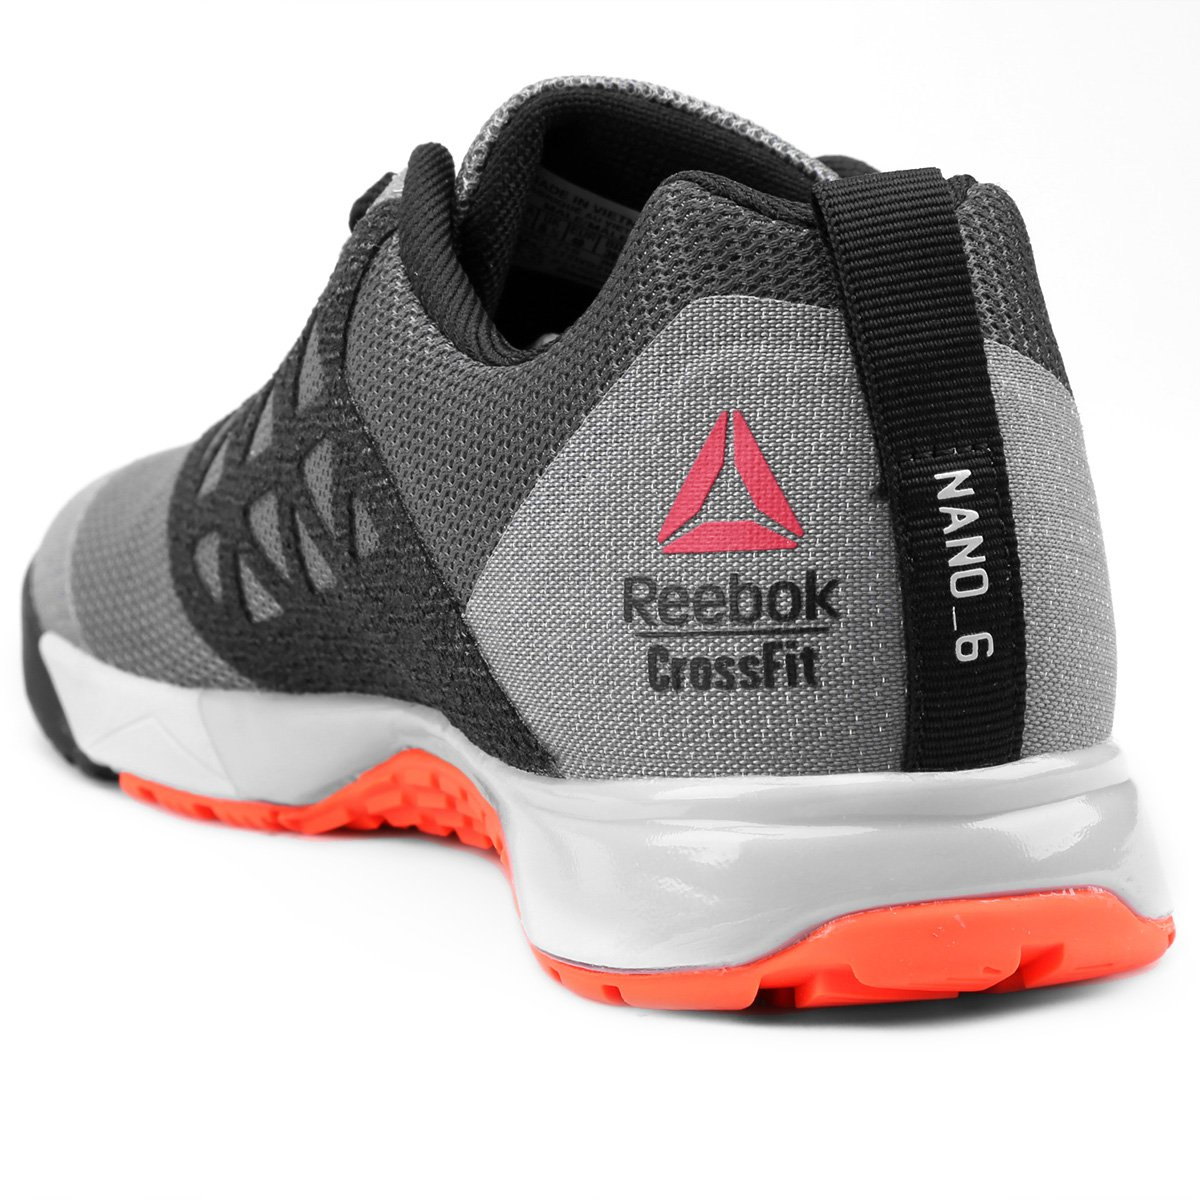 Tênis Reebok Crossfit Nano 6.0 Masculino - Compre Agora  f3f087997fc5e